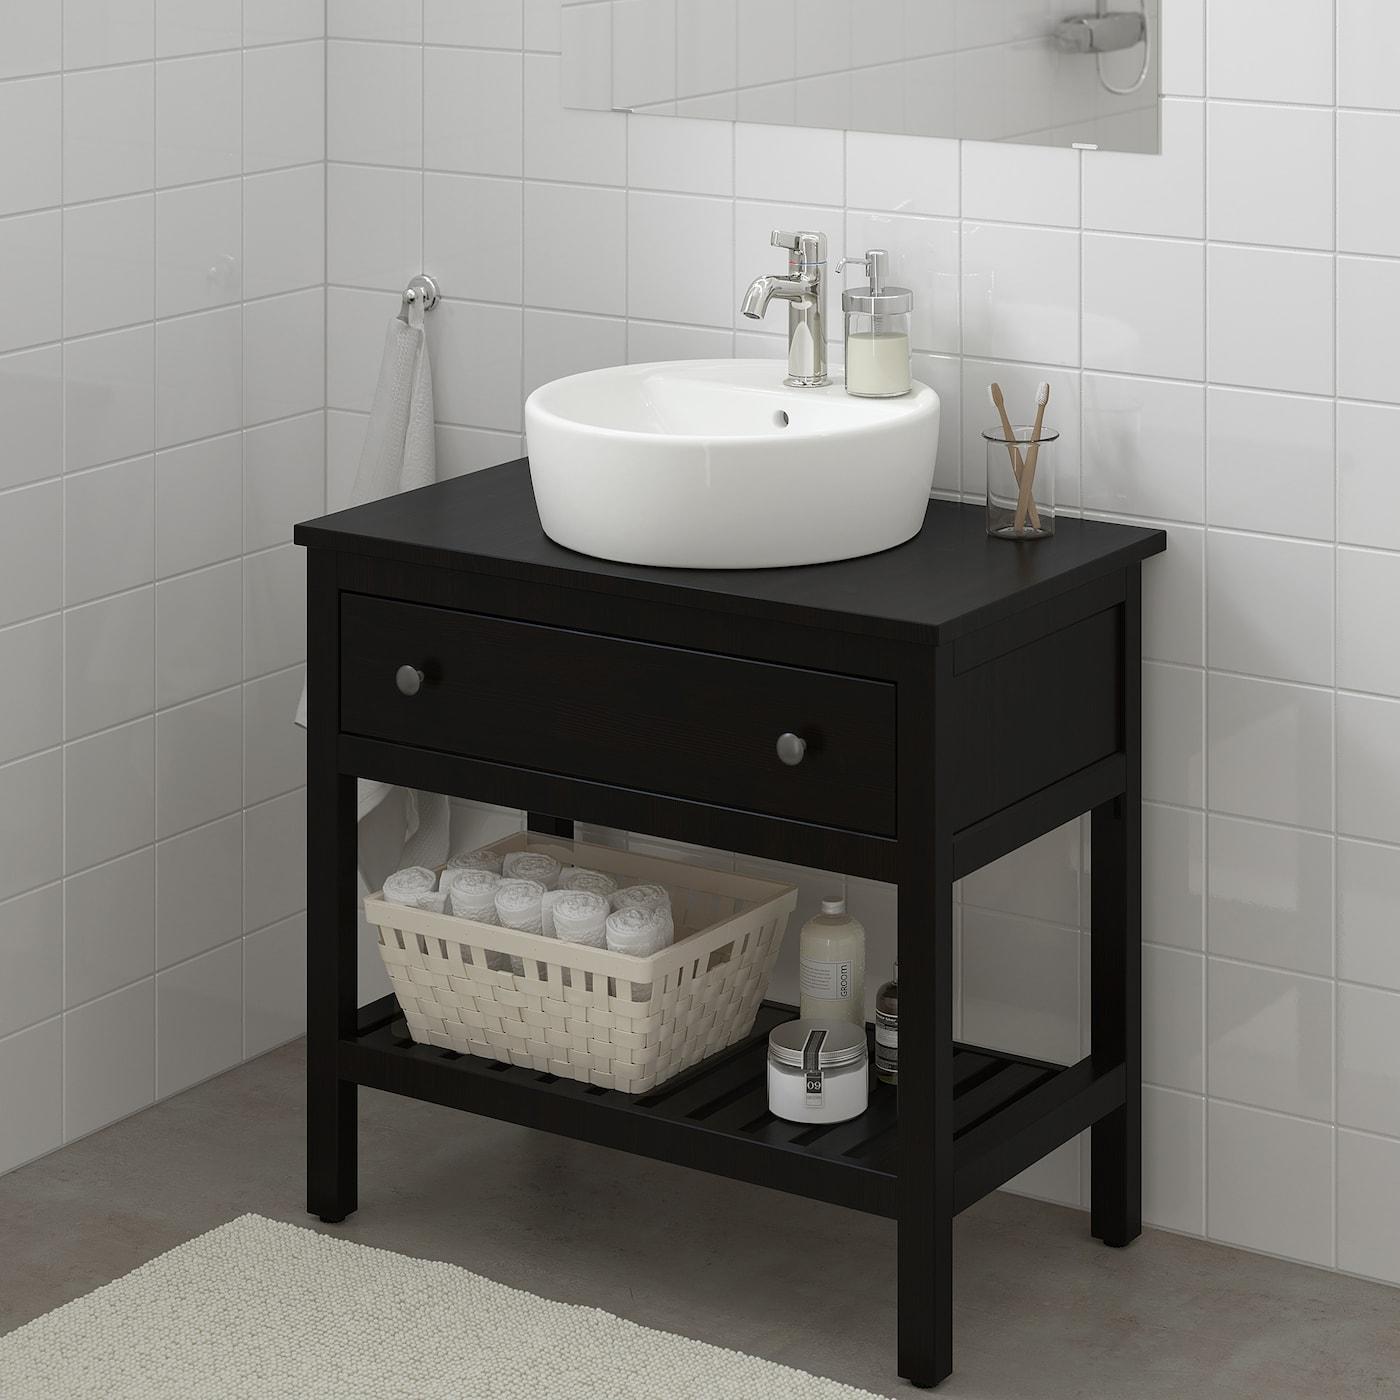 "HEMNES Bathroom vanity 9 drawer - black-brown stain 9 9/9x99 9/9x9 9/9 ""  (92x99x96 cm)"